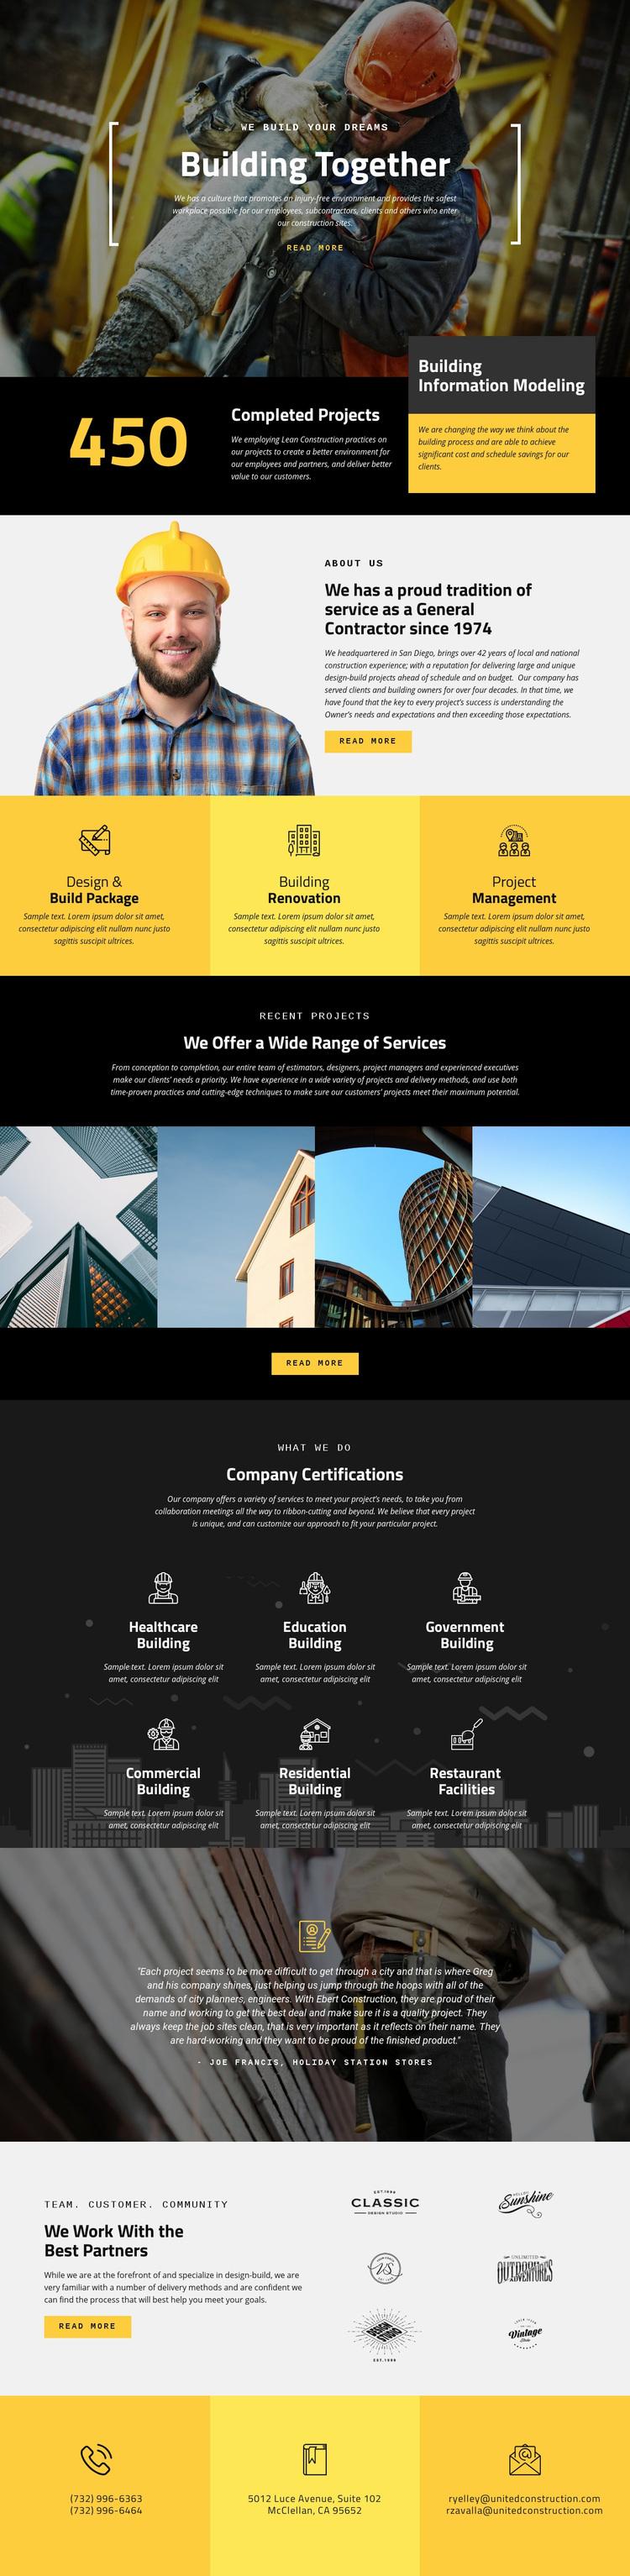 Building constructions Web Page Designer